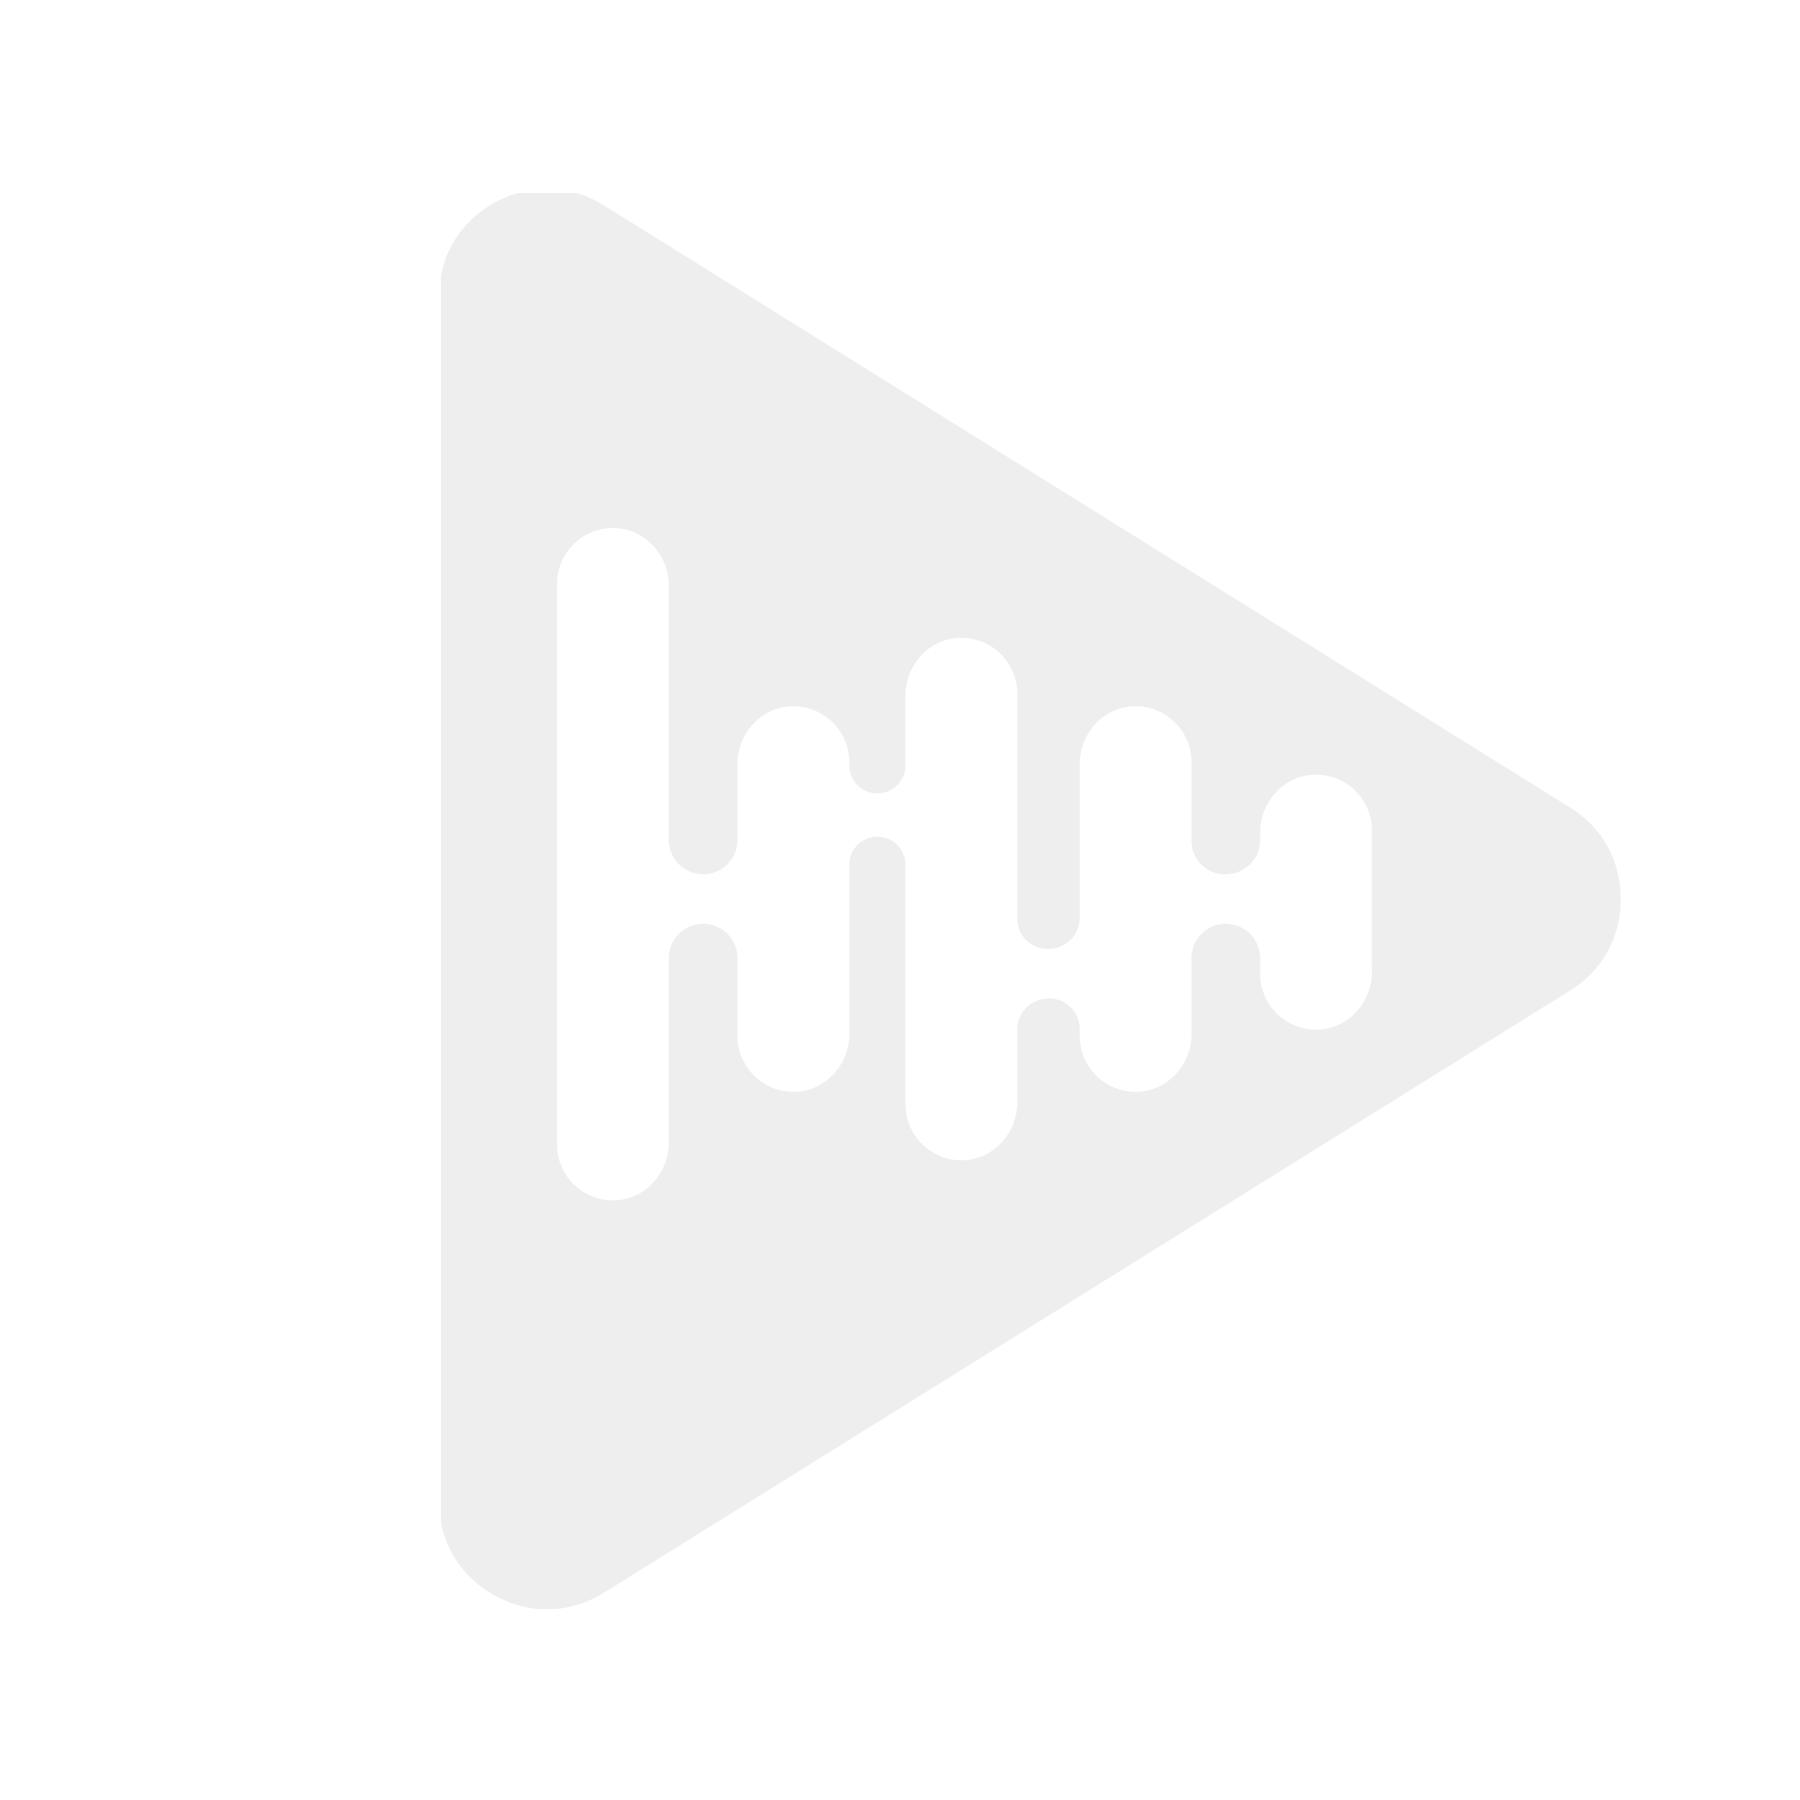 Speedsignal B-3674702+C9544I-CAN